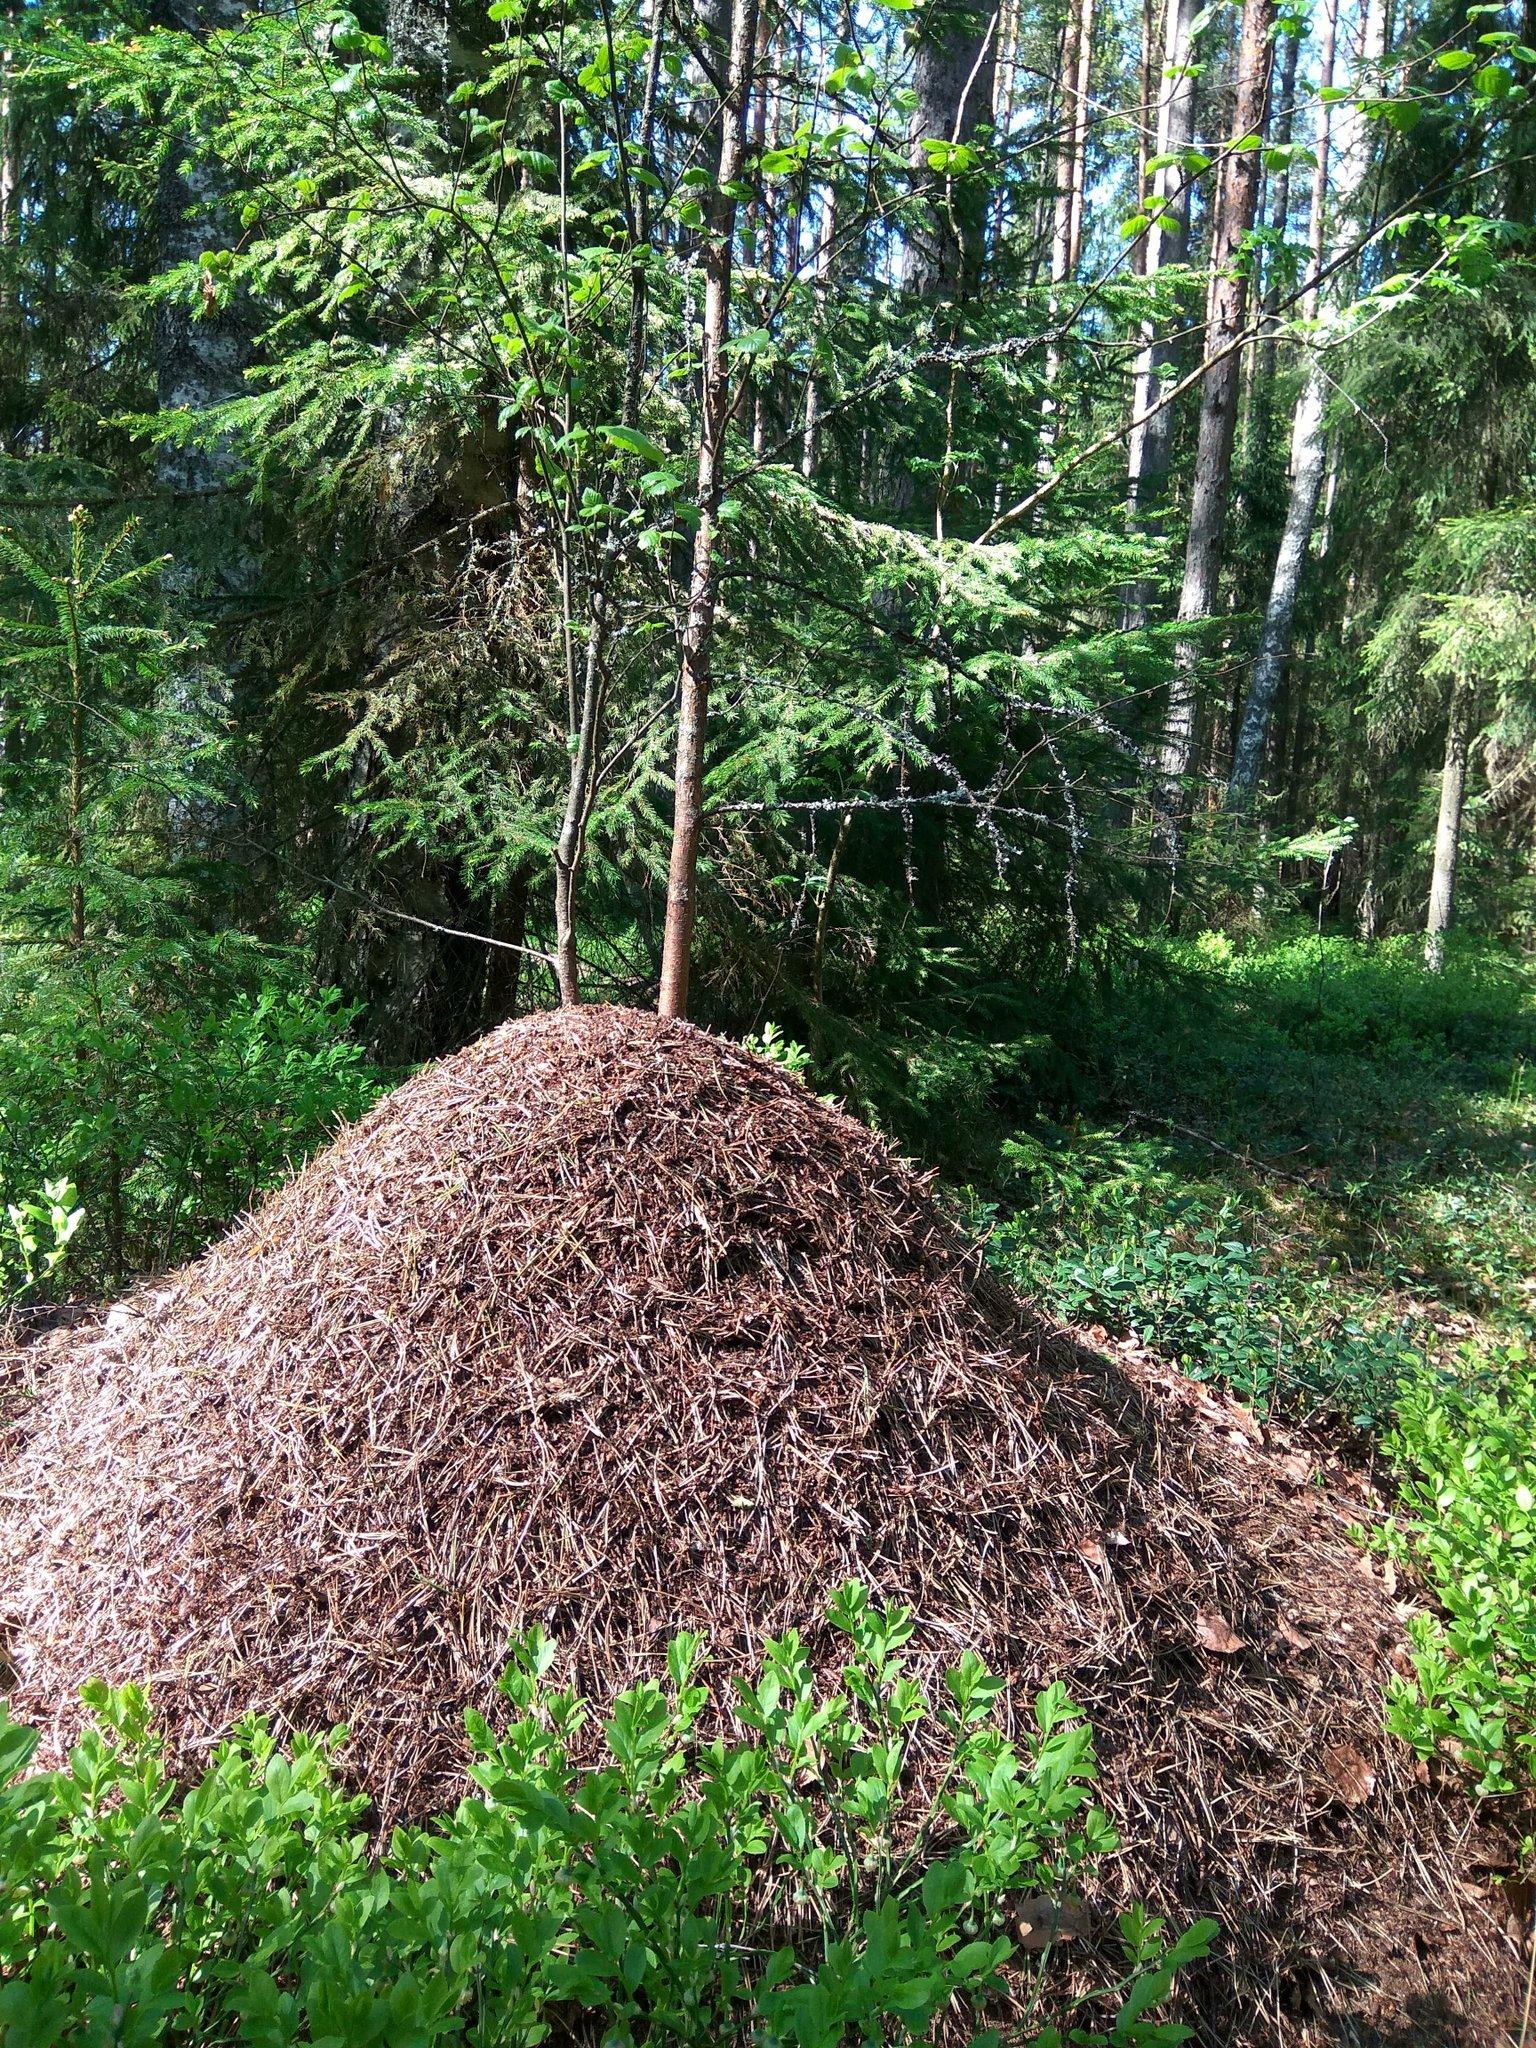 школе муравейник в лесу картинки начала следует